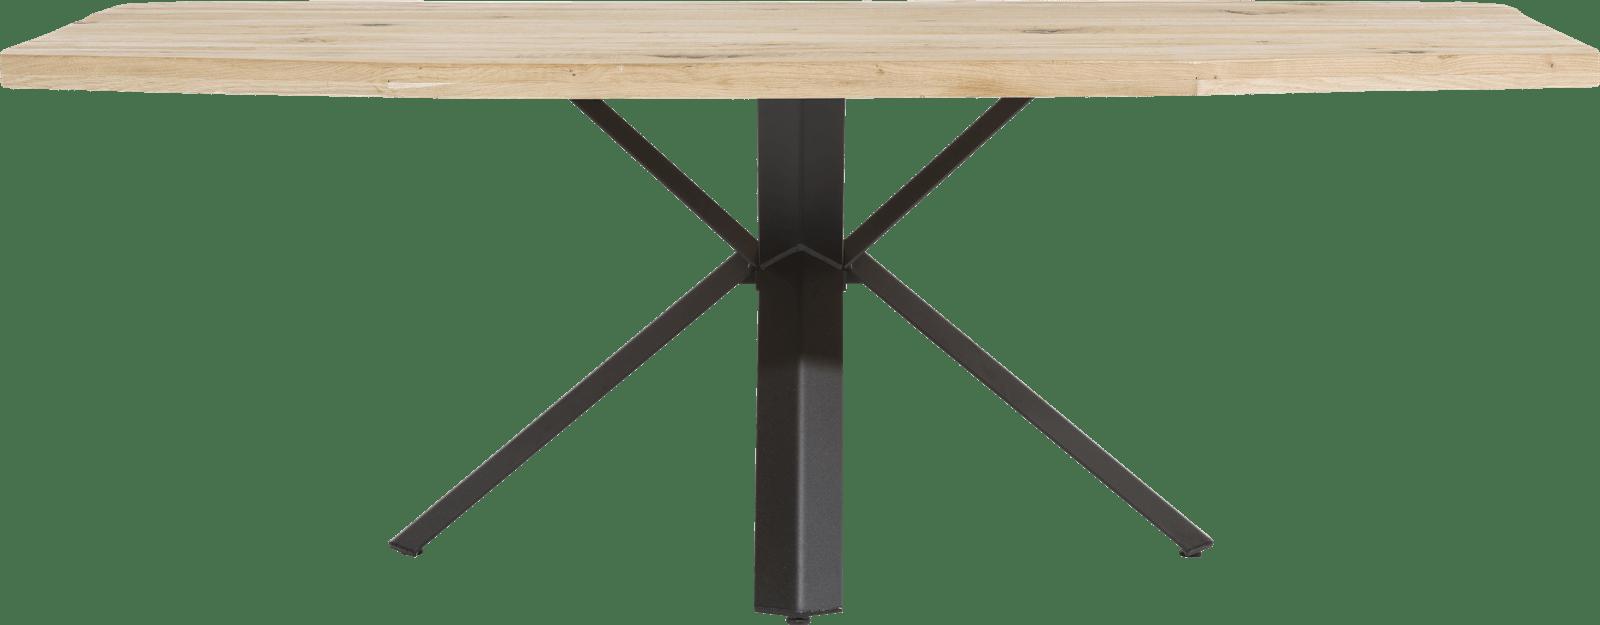 XOOON - Maddox - Industrieel - eetkamertafel 220 x 100 cm - hout - sterpoot